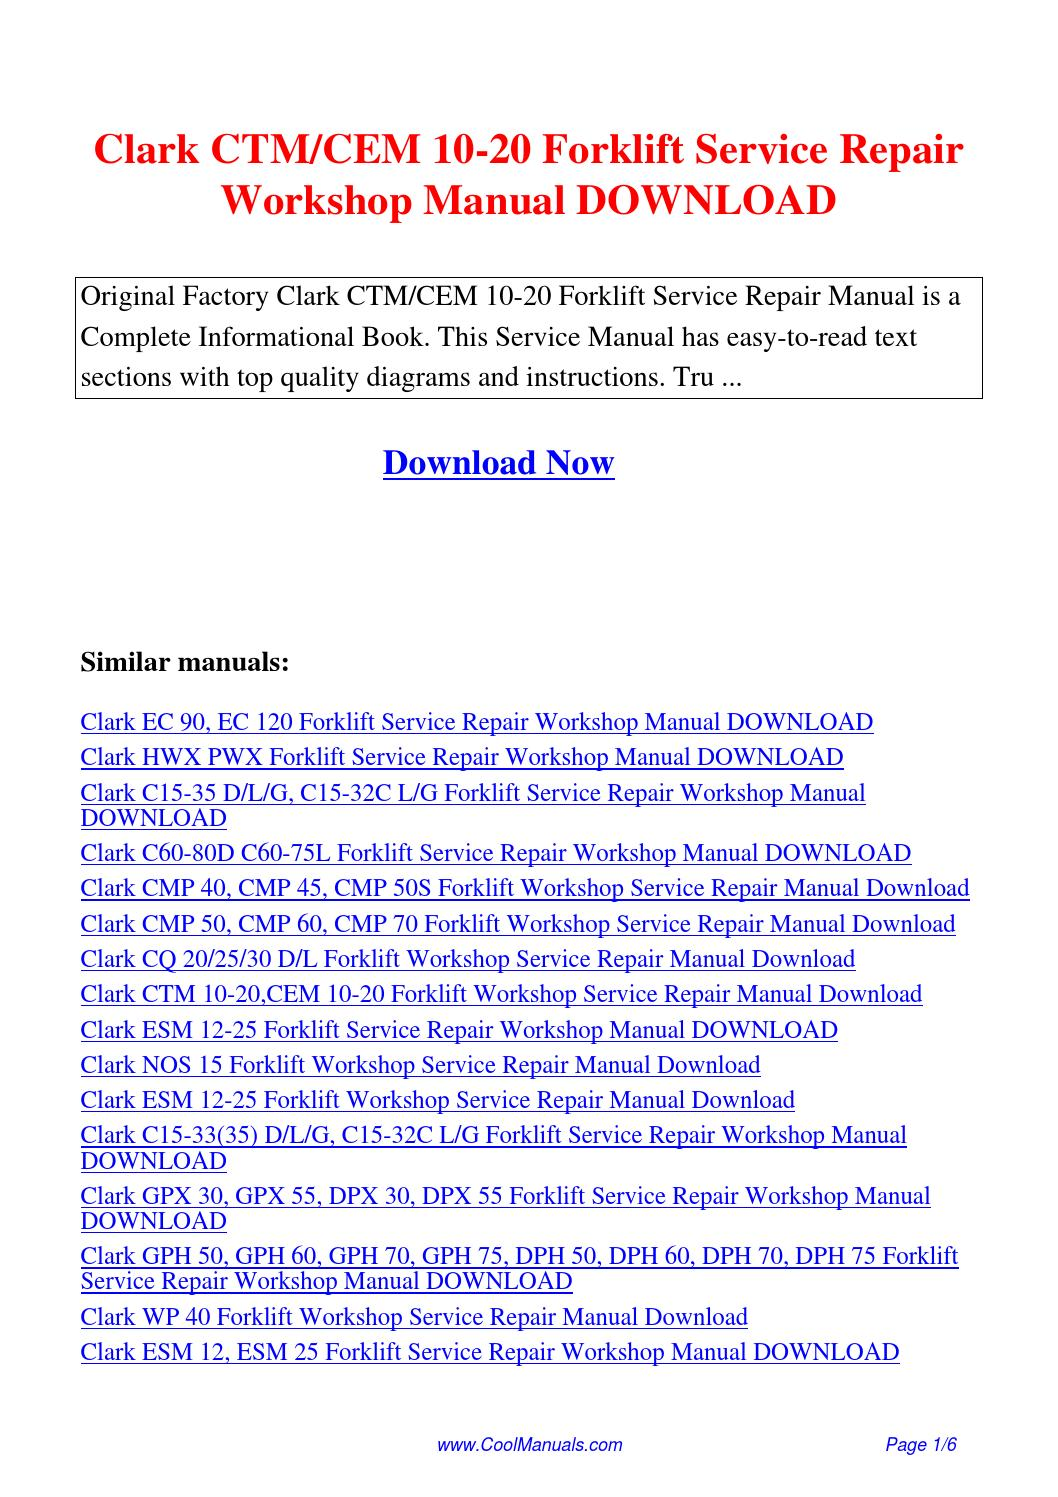 Clark C500 35 Manual Gcx25 Wiring Diagram 1993 Pdf Document Preview 1 Array Ctm Cem 10 20 Forklift Service Repair Workshop By Rh Issuu